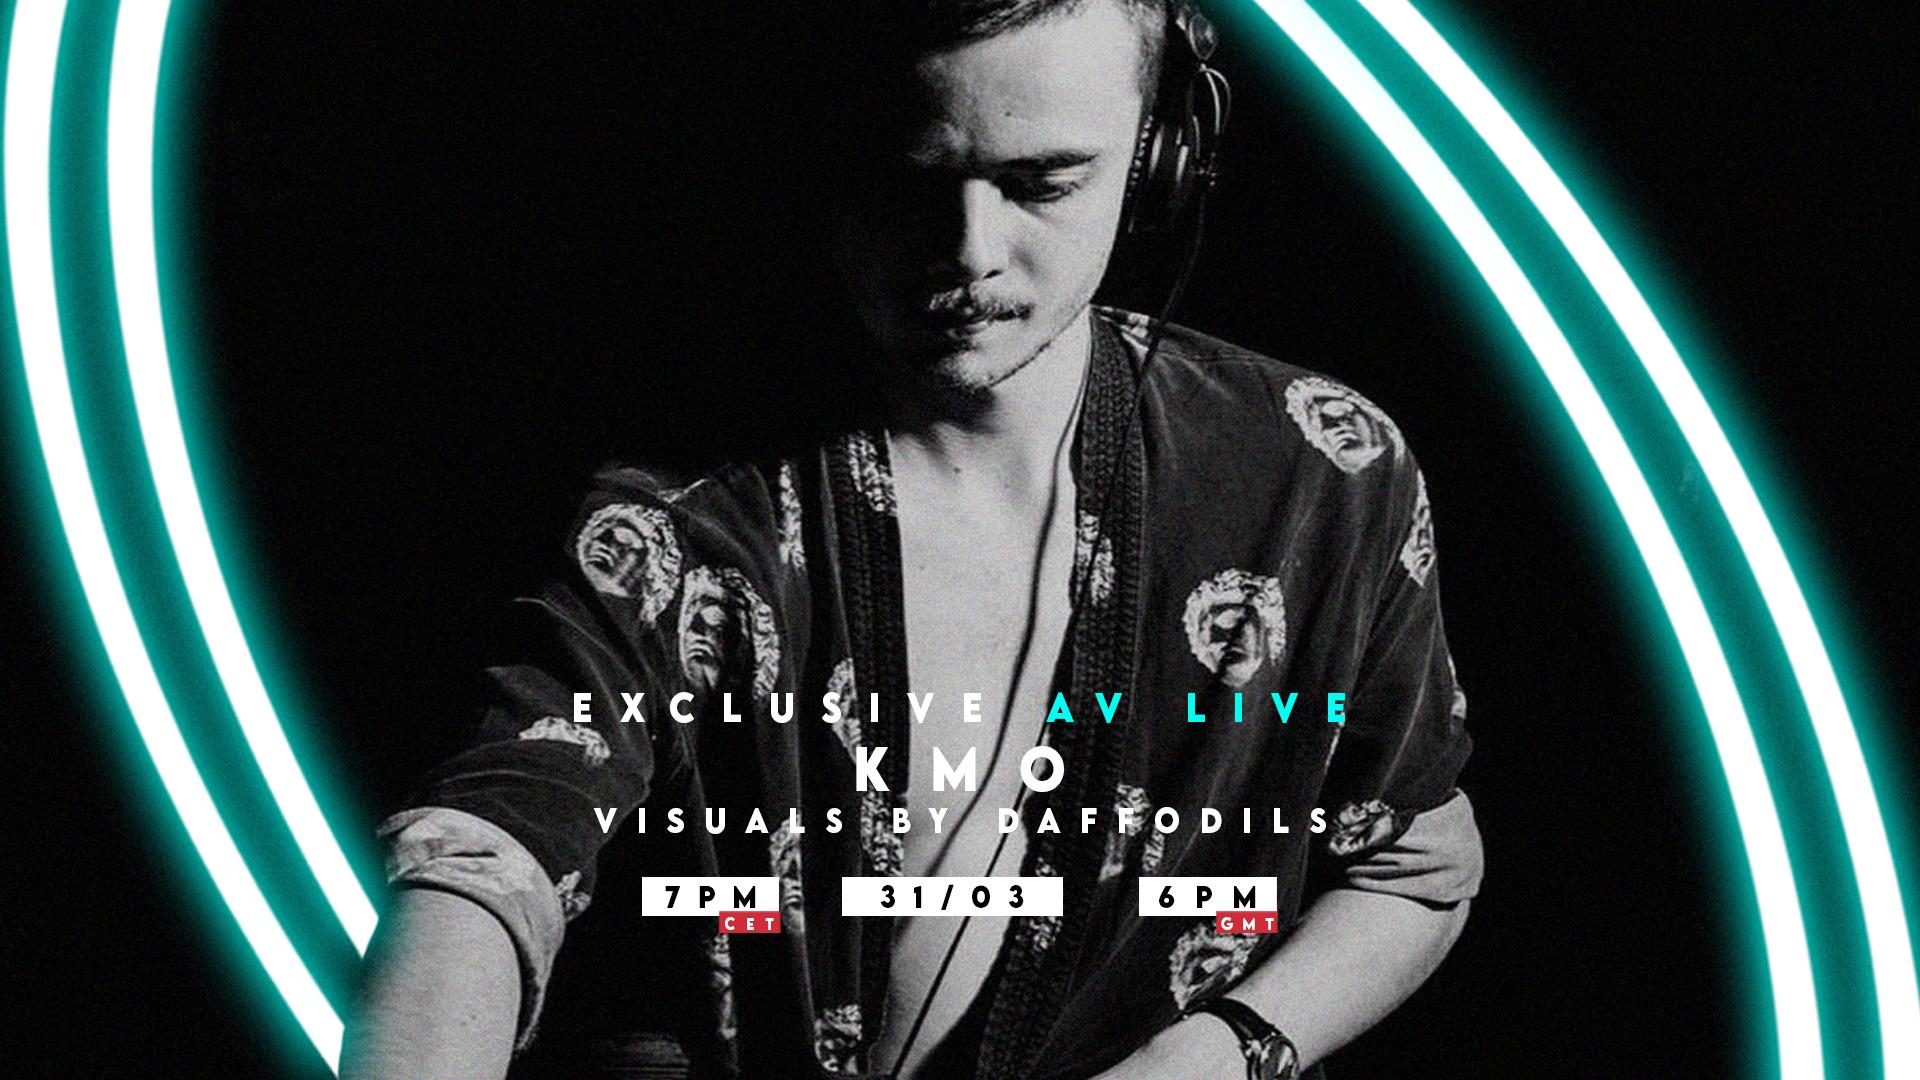 KMO exclusive AV Live with Daffodils by La Quarantaine